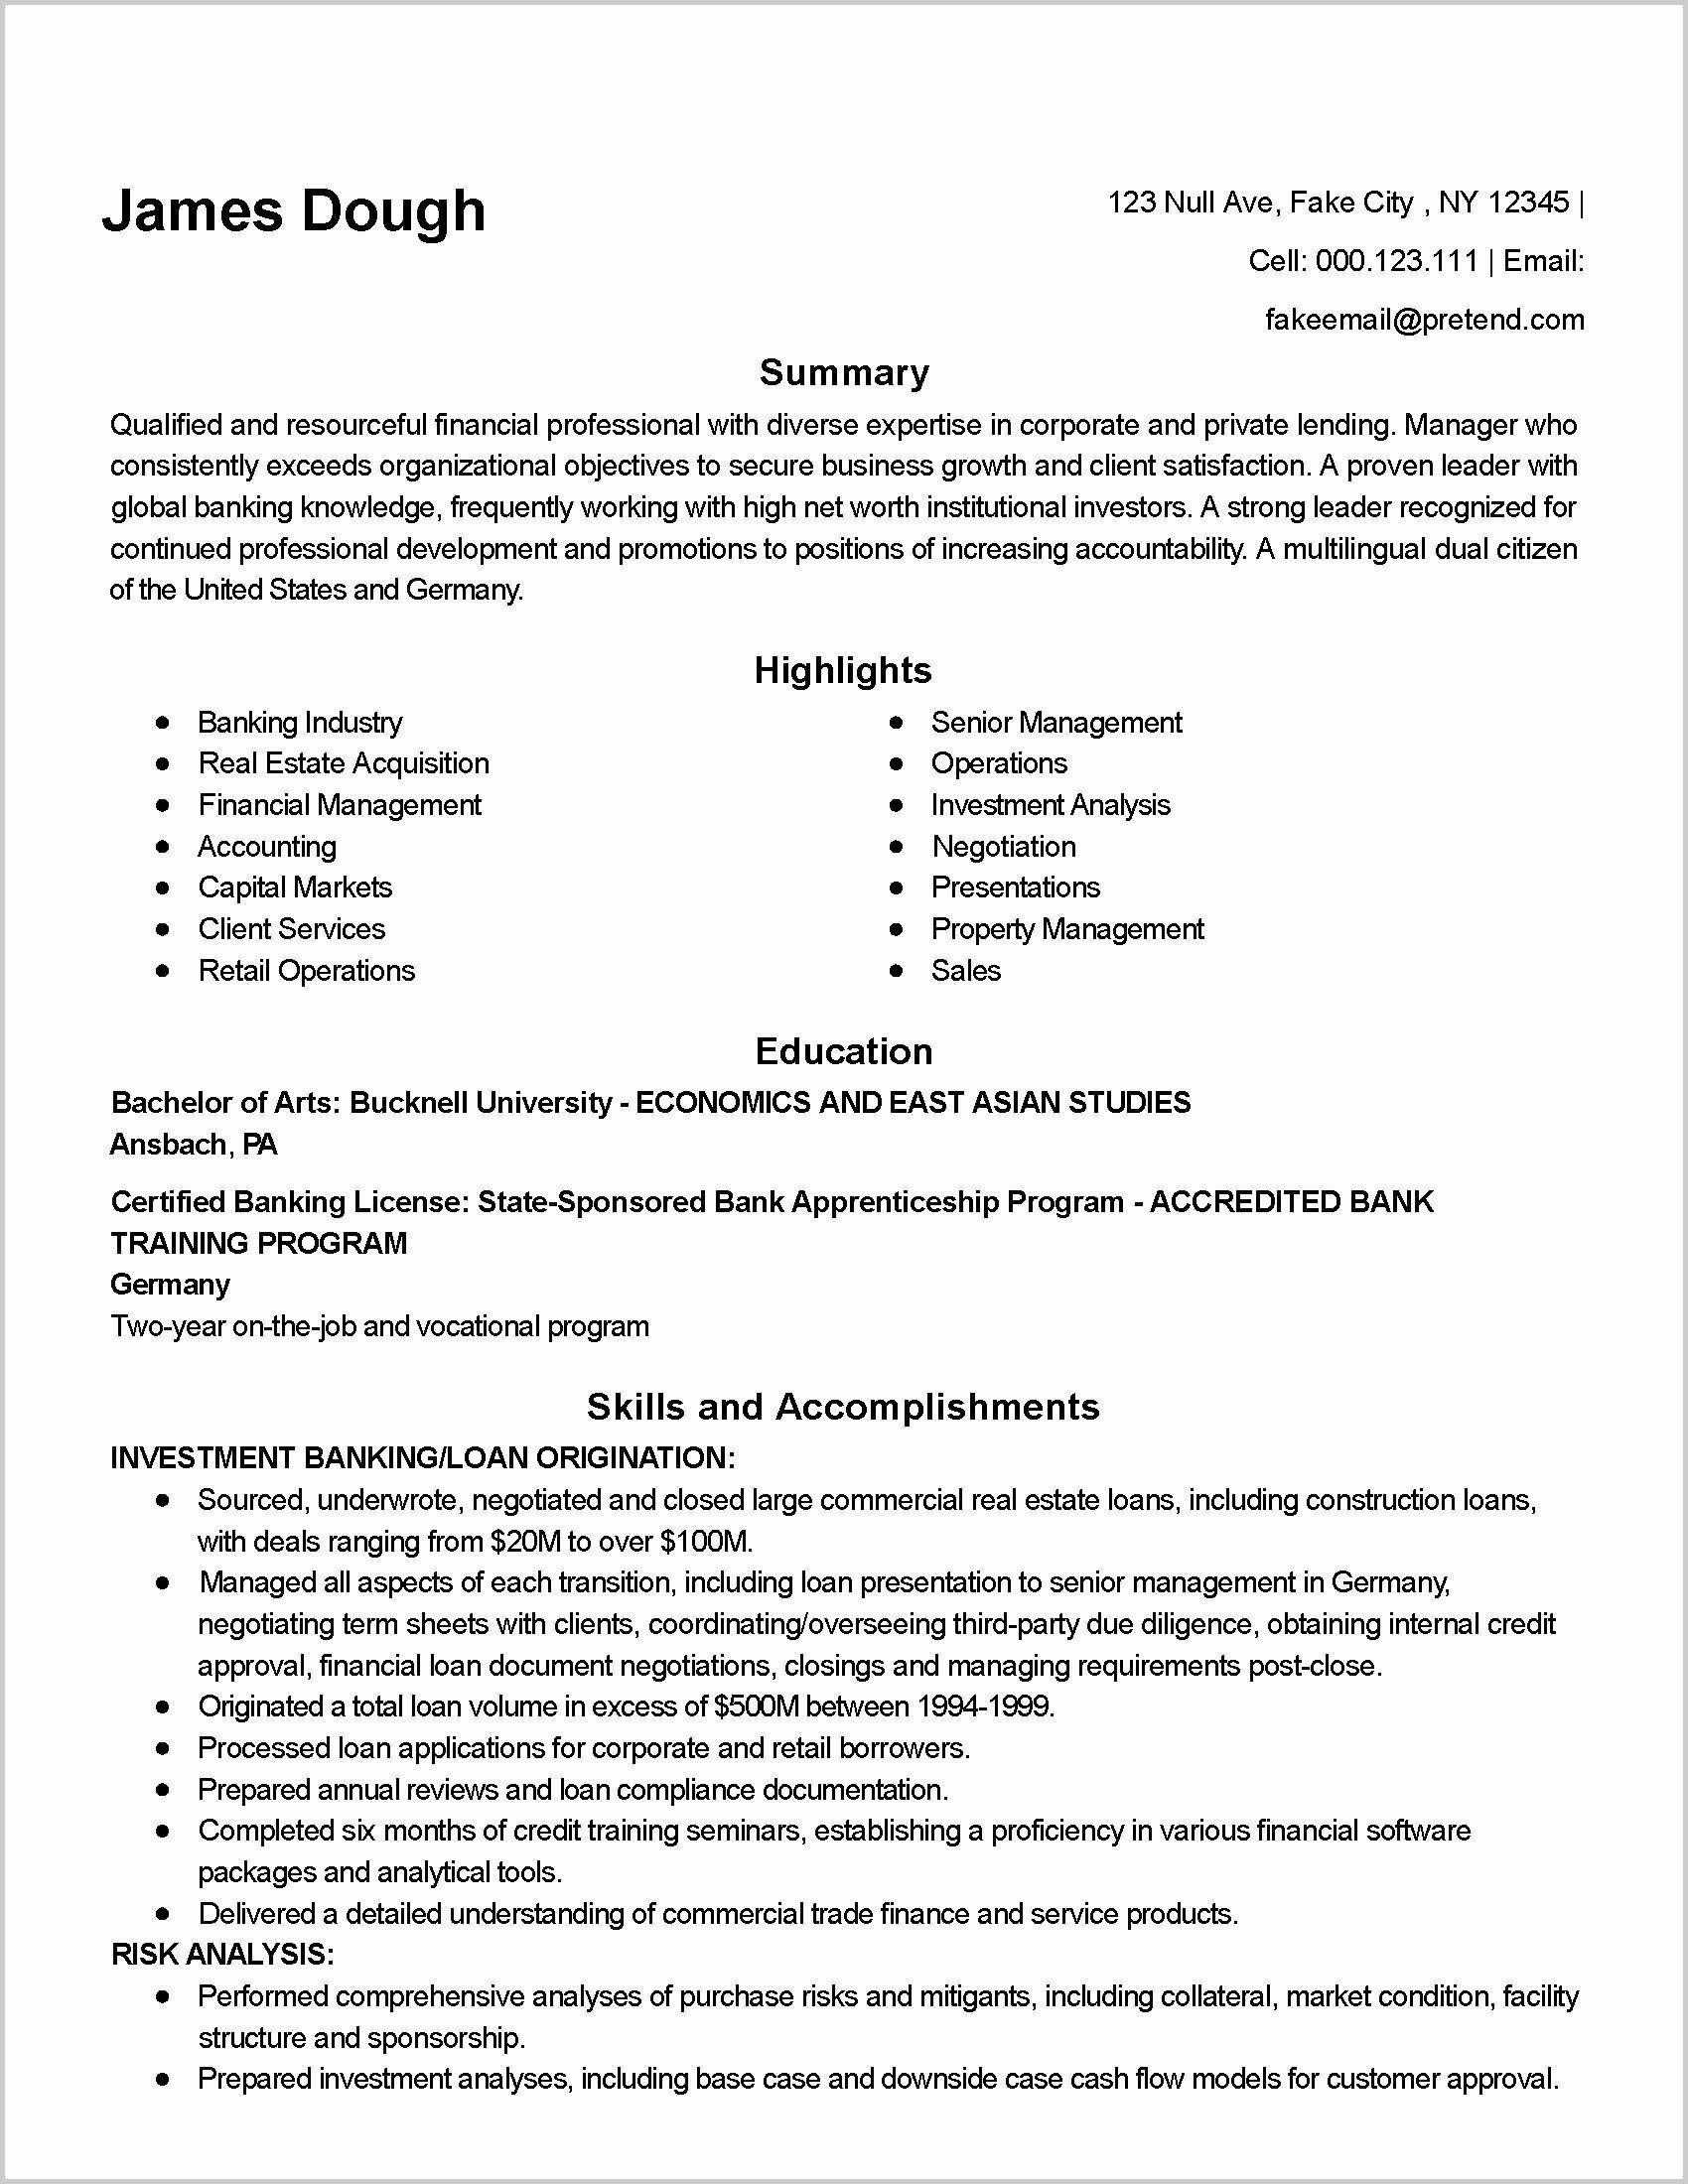 Wall Street Oasis Resume Inspirational 10 Wall Street Oasis Resume Review Cover Letter For Resume New Grad Nursing Resume Resume Cover Letter Examples